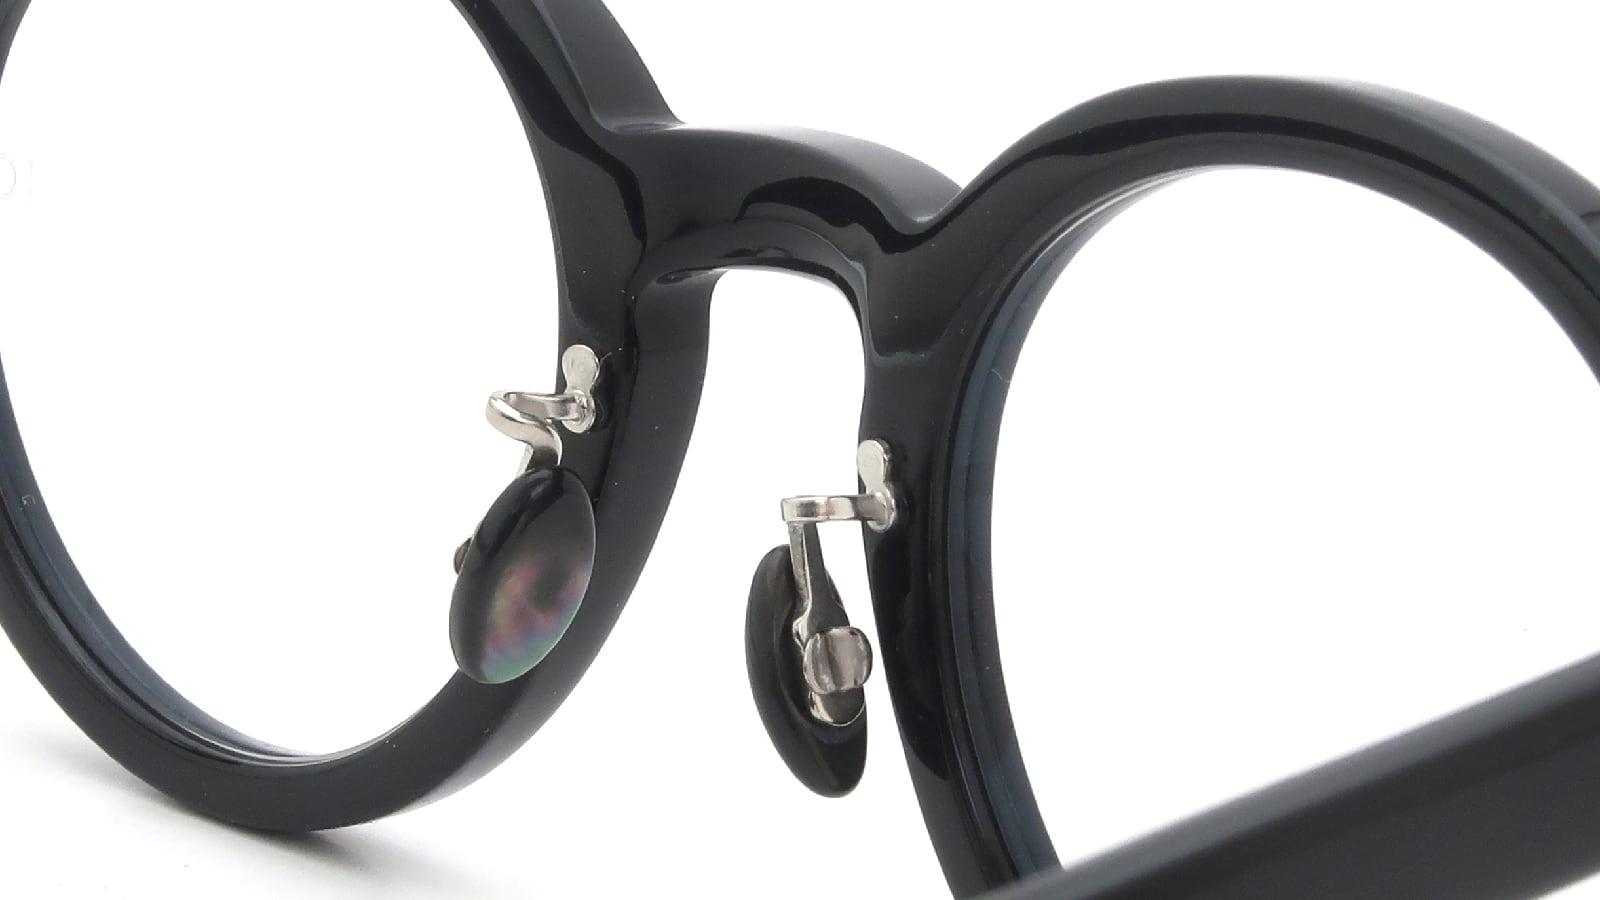 10 eyevan NO.5 Ⅲ FR 44size c.1002S Black 8